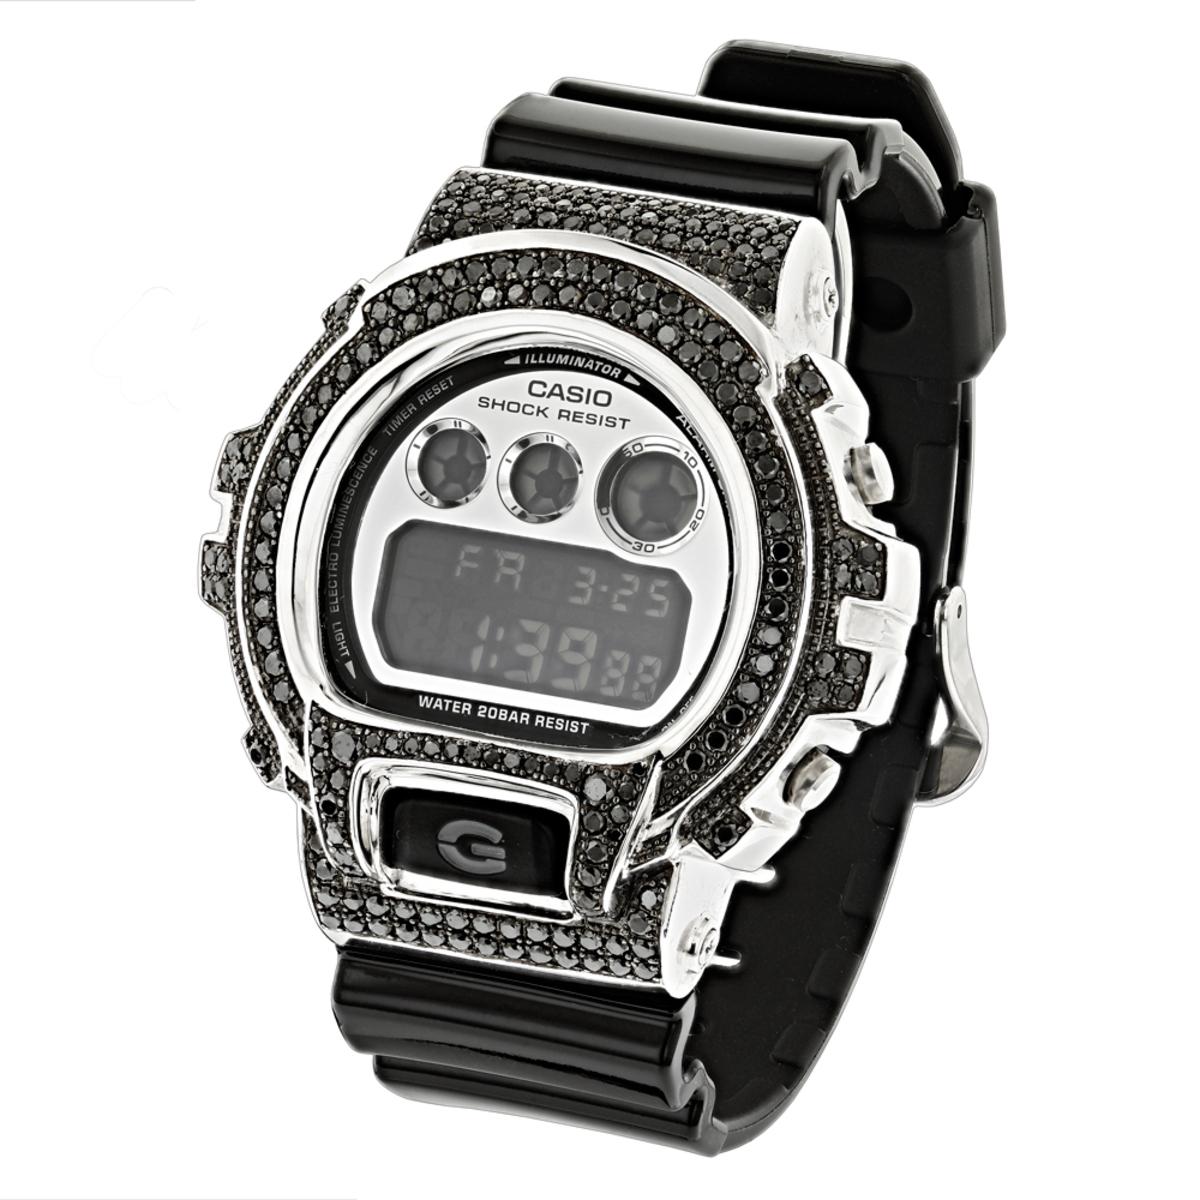 Hip Hop Watches for Men: Casio G-Shock DW6900 Black Diamond Bezel Watch 4ct